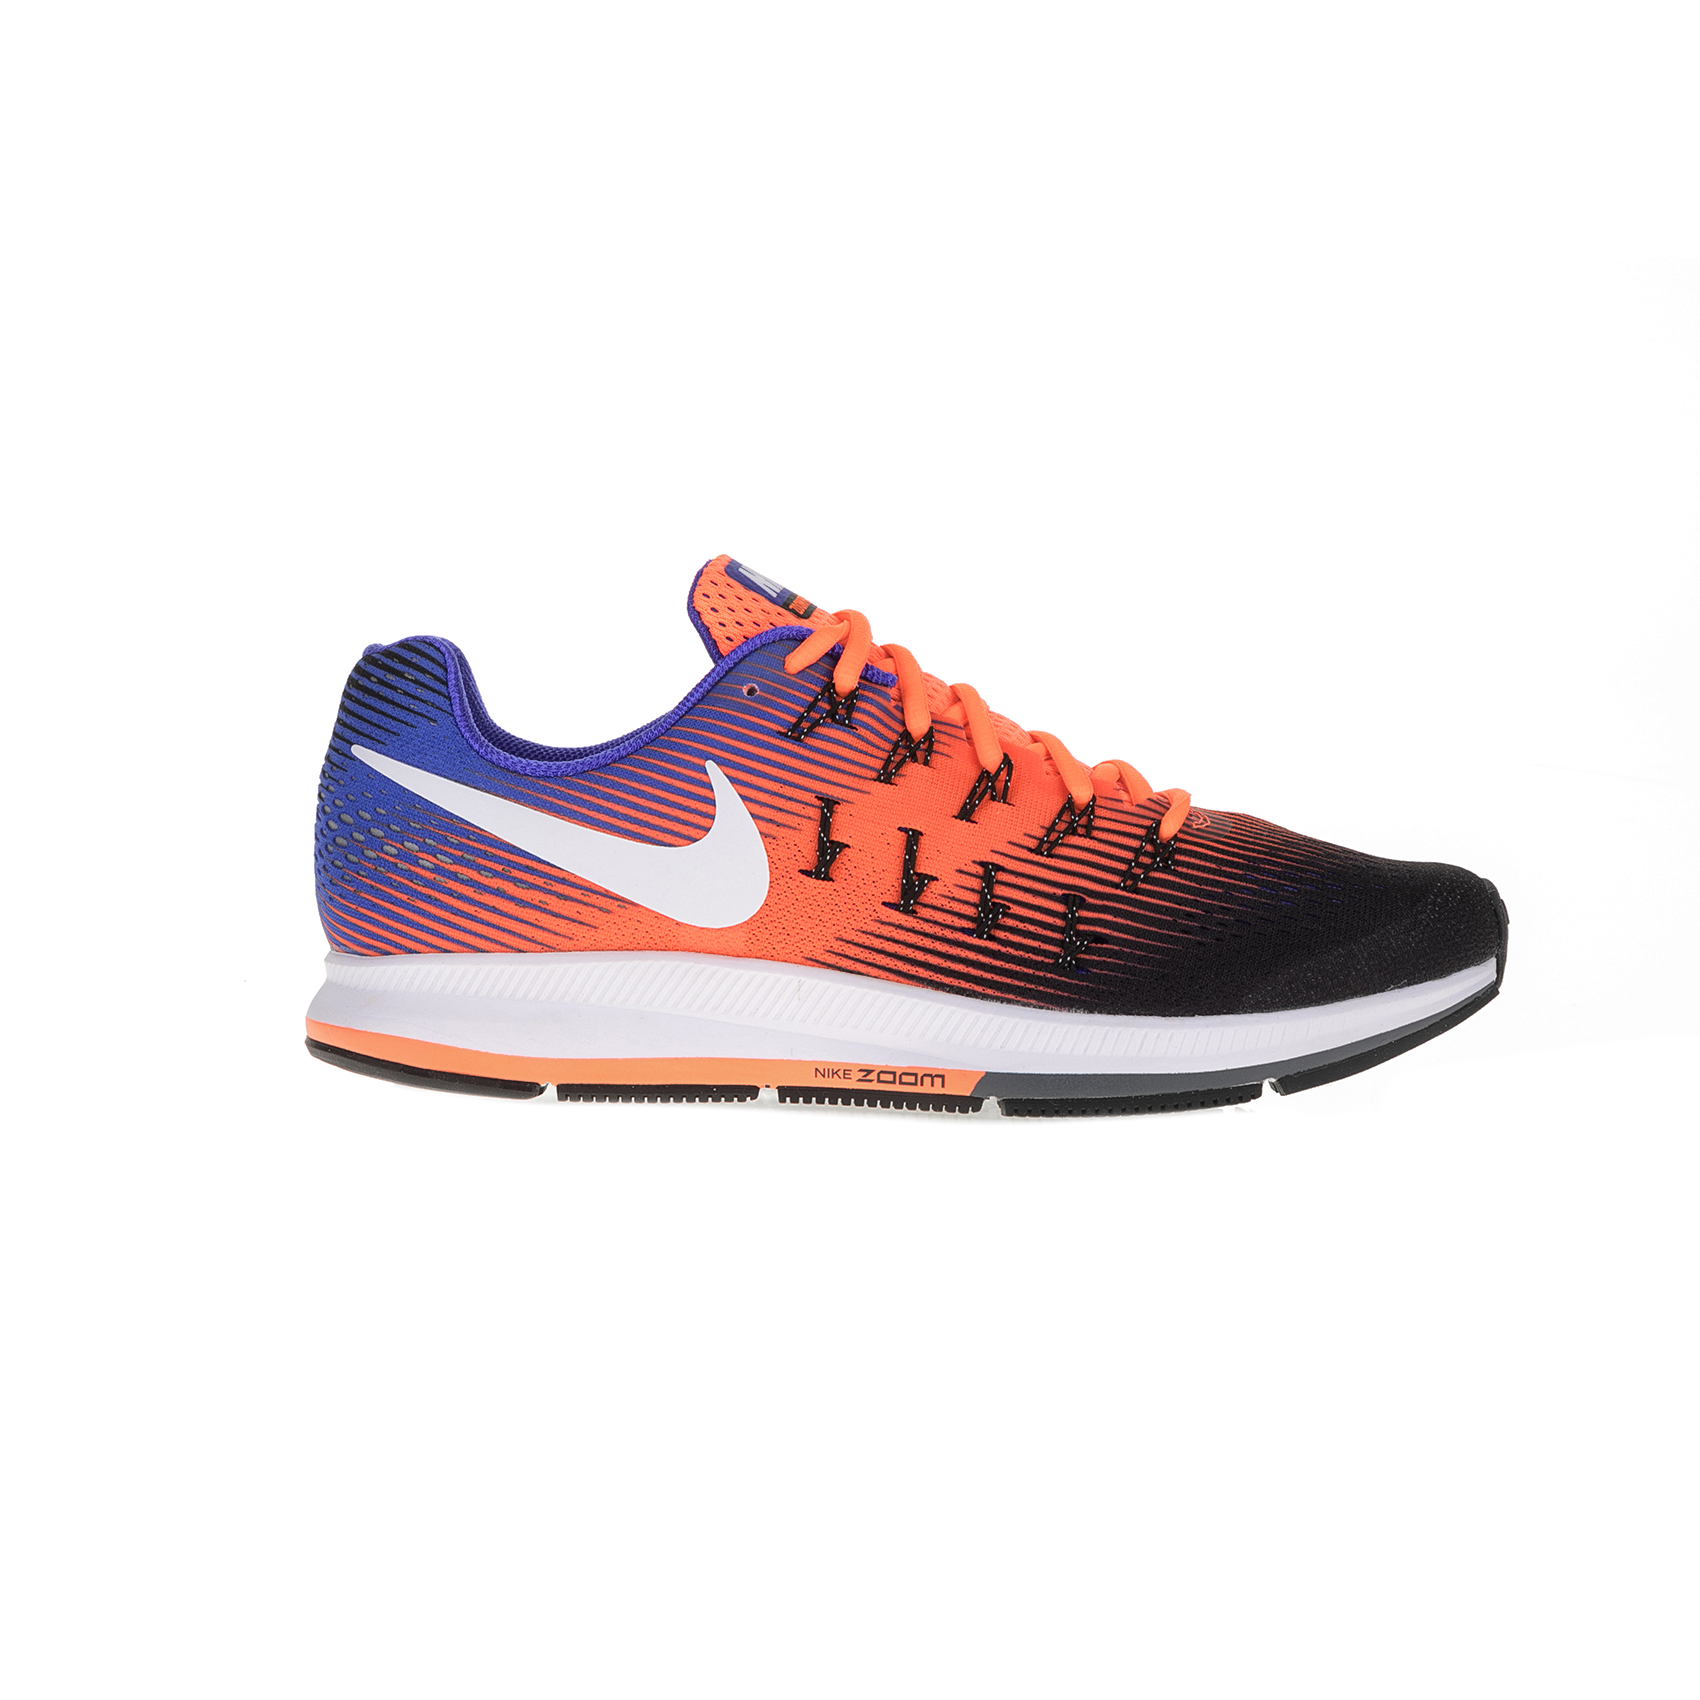 NIKE - Ανδρικά αθλητικά παπούτσια Nike AIR ZOOM PEGASUS 33 μπλε-πορτοκαλί-μαύρα ανδρικά παπούτσια αθλητικά running